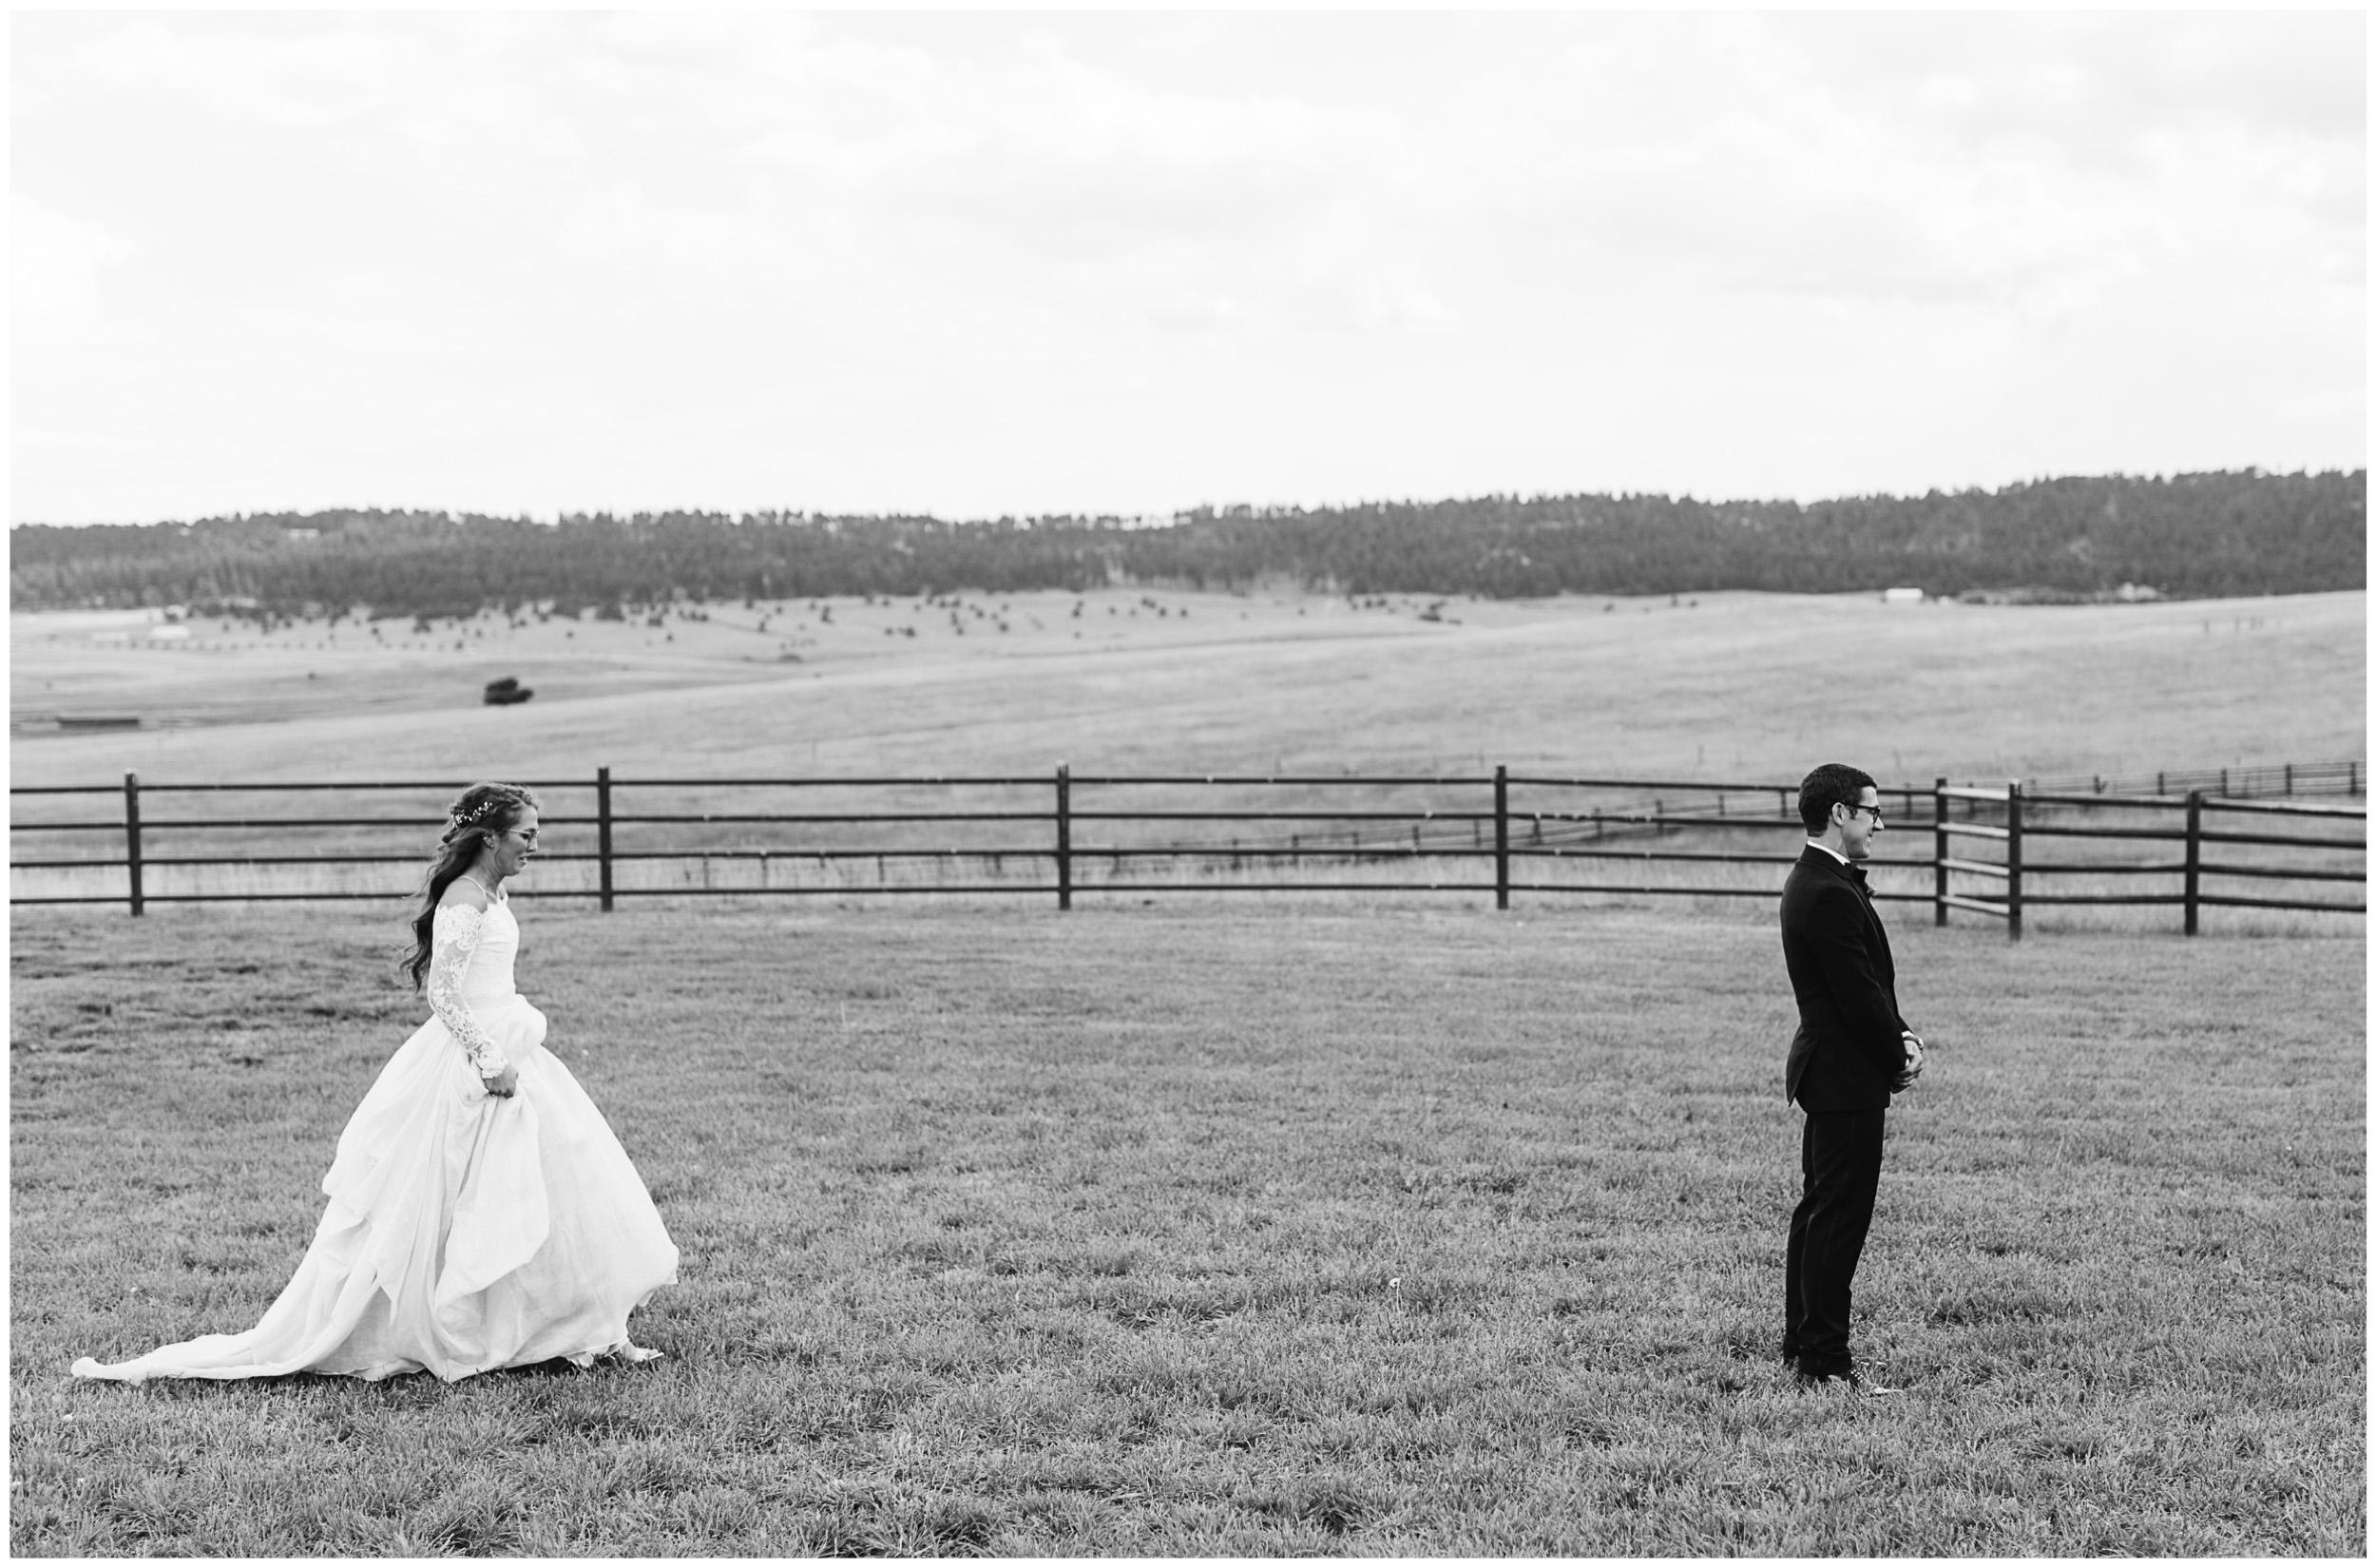 spruce_mountain_ranch_wedding_19a.jpg